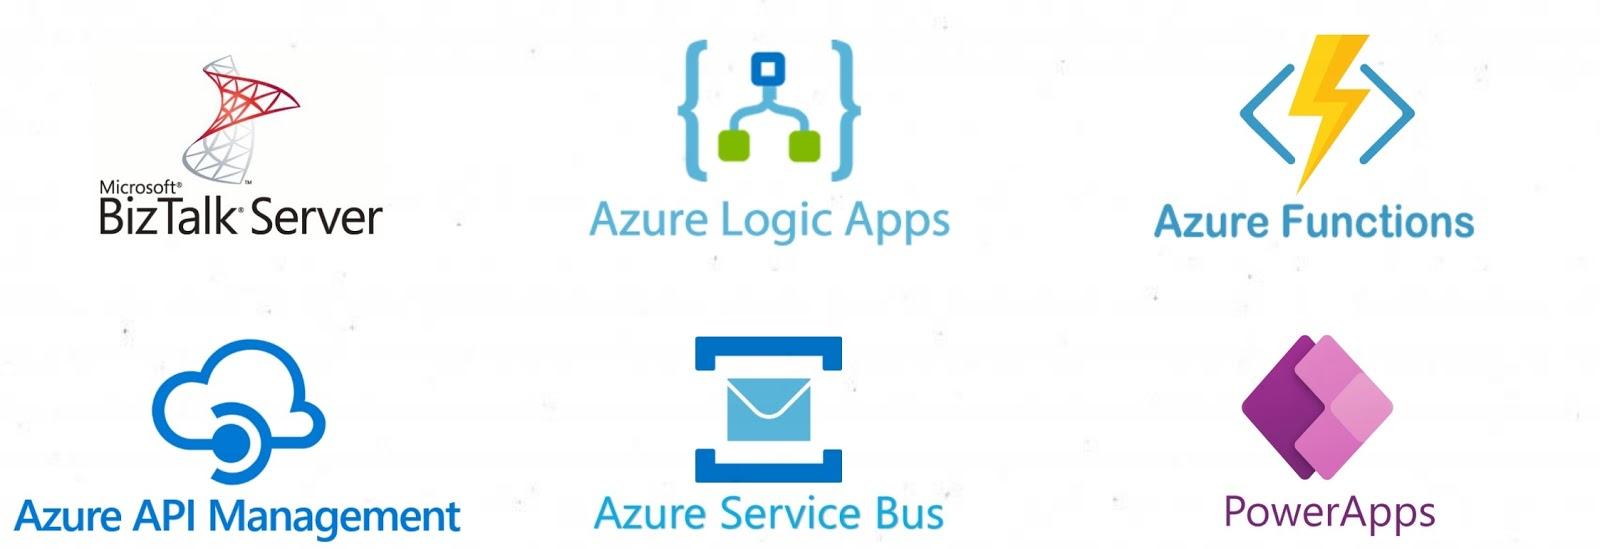 May 3, 2021 Weekly Update on Microsoft Integration Platform & Azure iPaaS